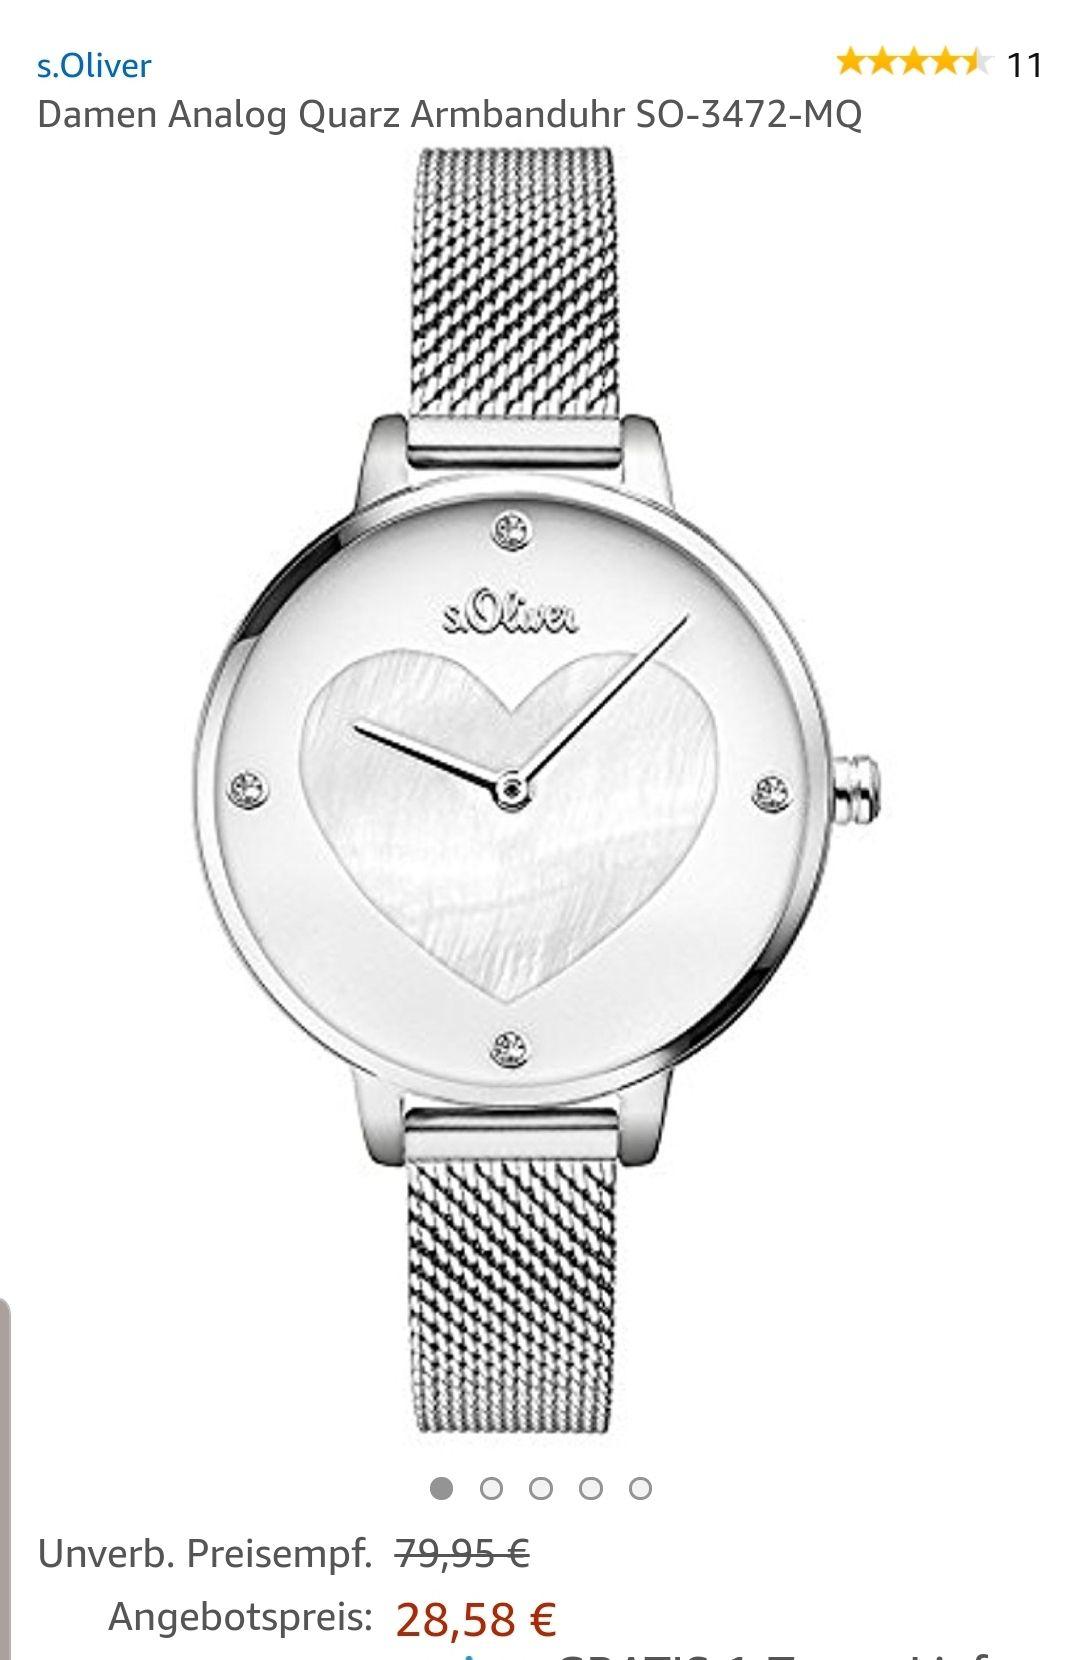 Amazon Prime - S.Oliver Damen Armbanduhr